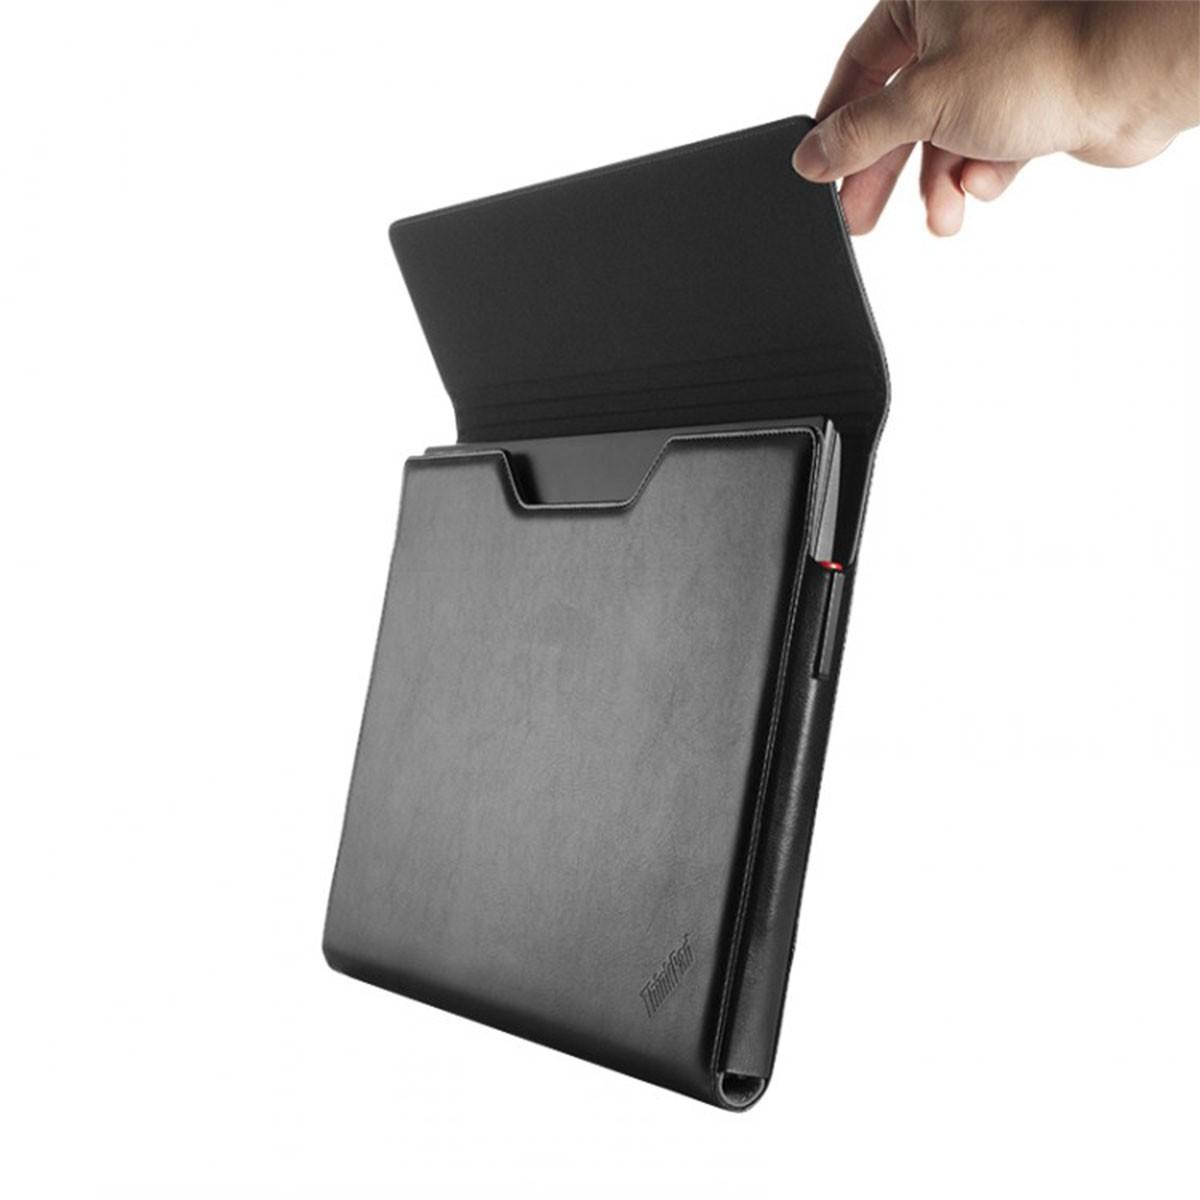 (EOL) Lenovo™ ThinkPad® Ultra Sleeve - Notebook-Hülle für T480s, T490s, X1 Carbon und X1 Yoga